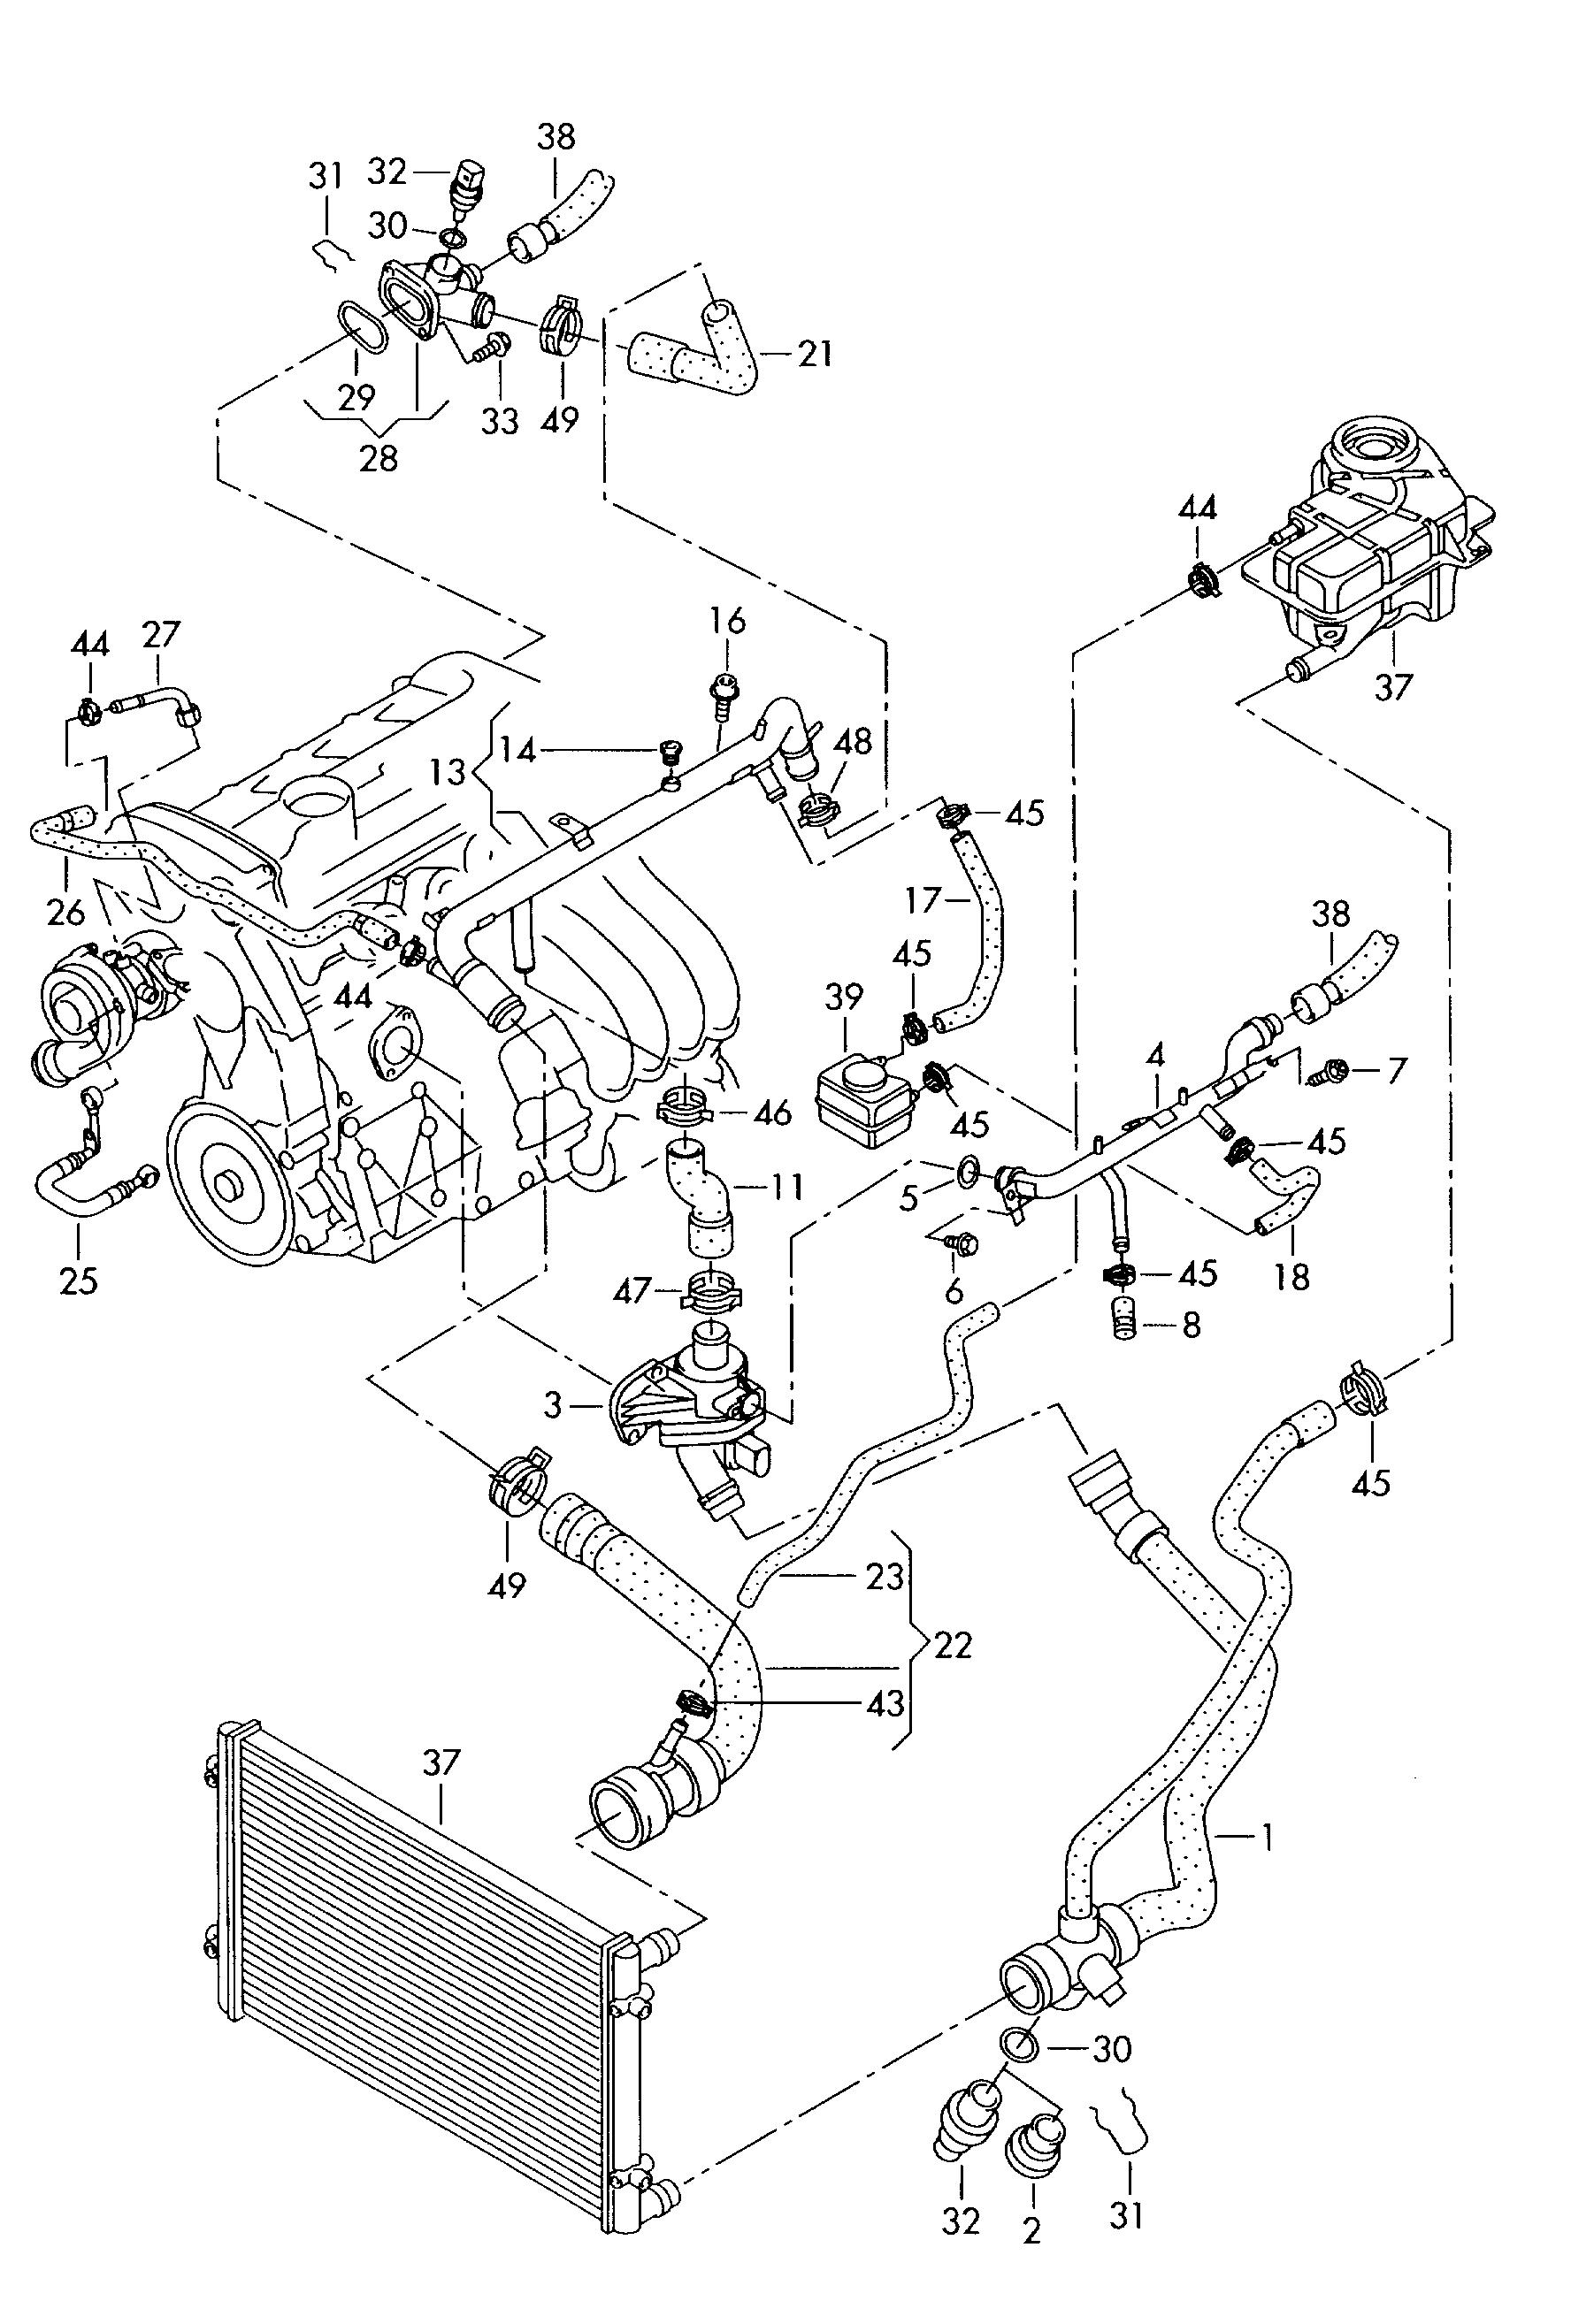 Audi 1 8 Engine Diagram - Coleman Thermostat Wiring Diagram for Wiring Diagram  Schematics | Audi Engine Diagram Audi A4 1 8 |  | Wiring Diagram Schematics